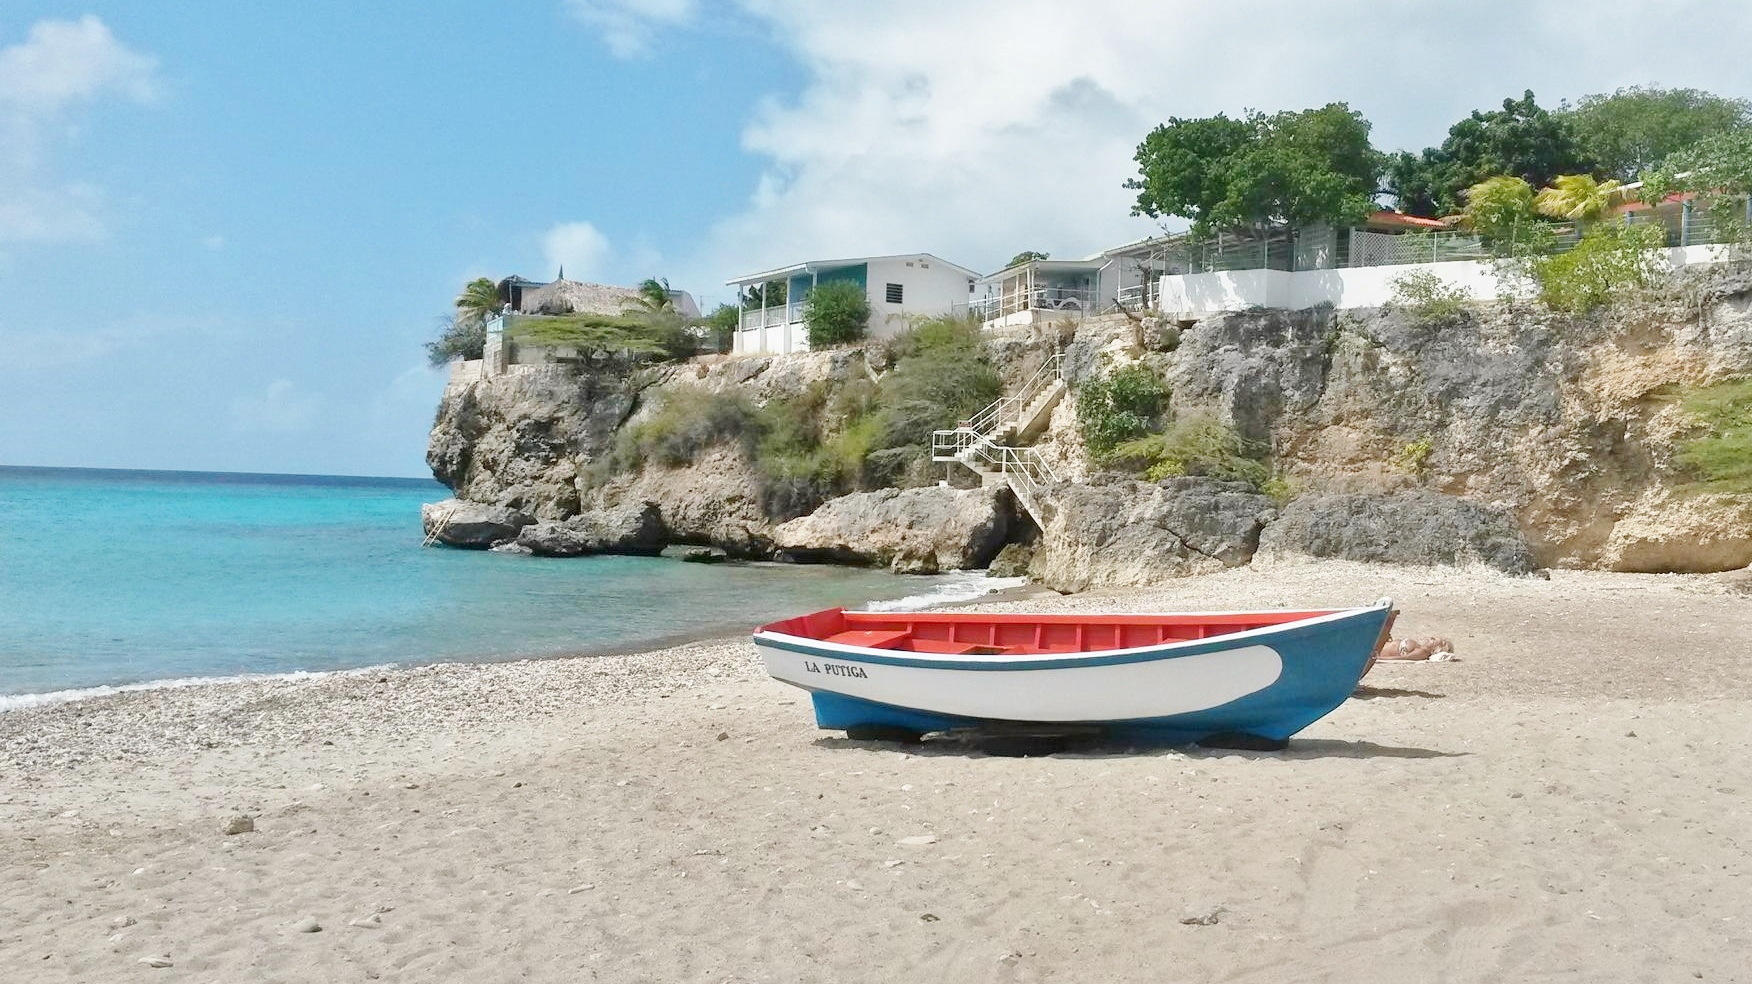 Playa-Piskado